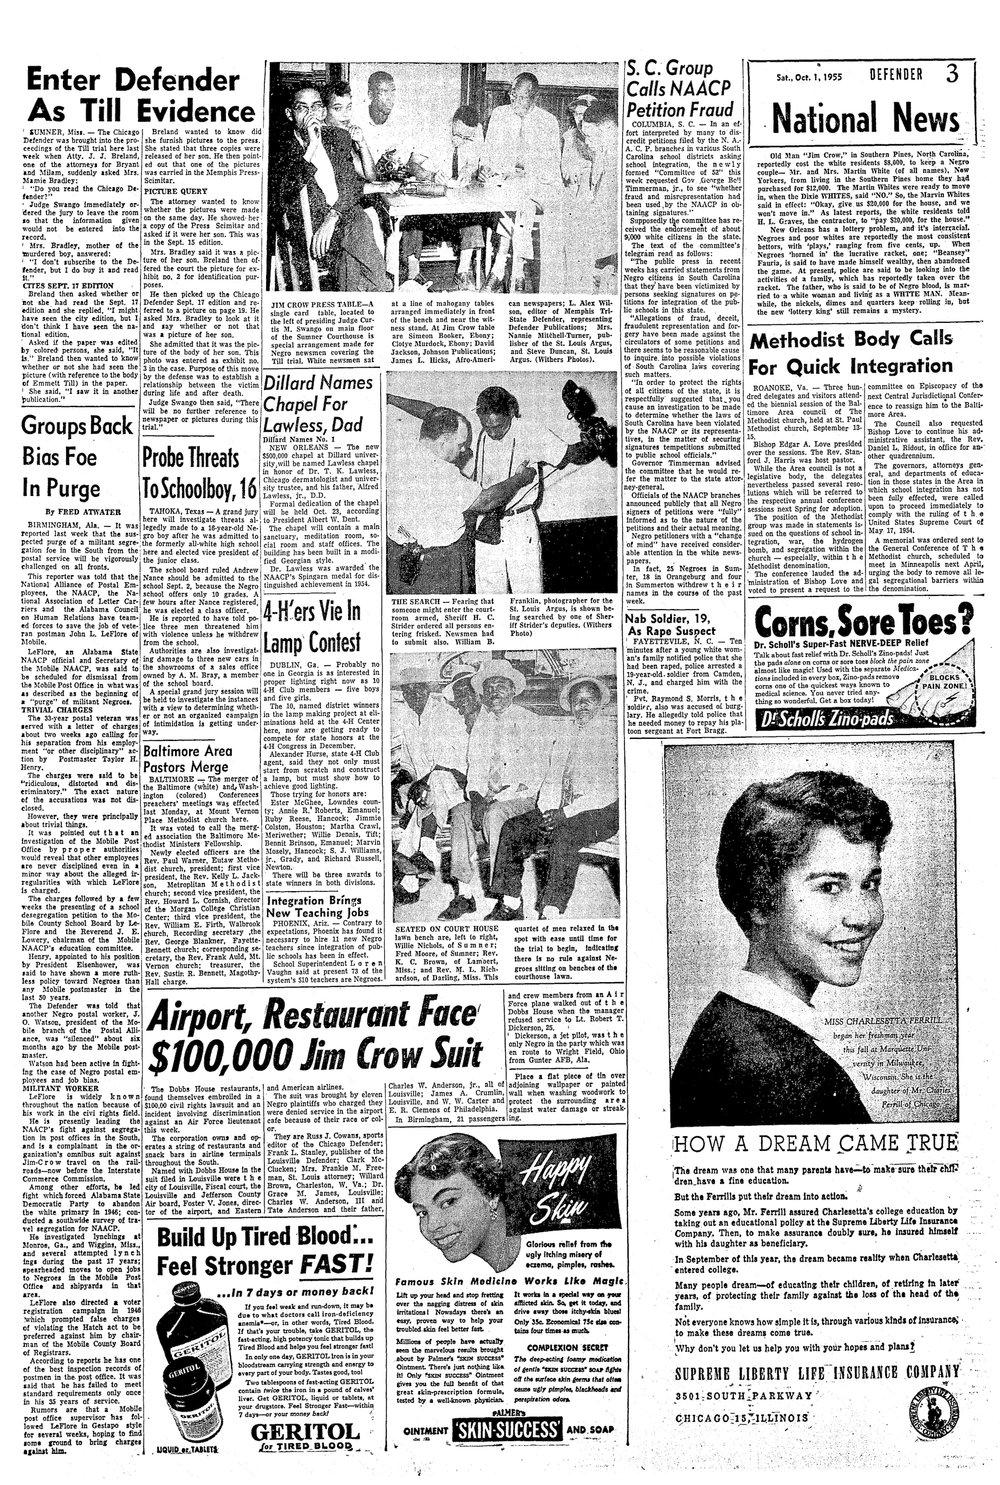 10.1.1955